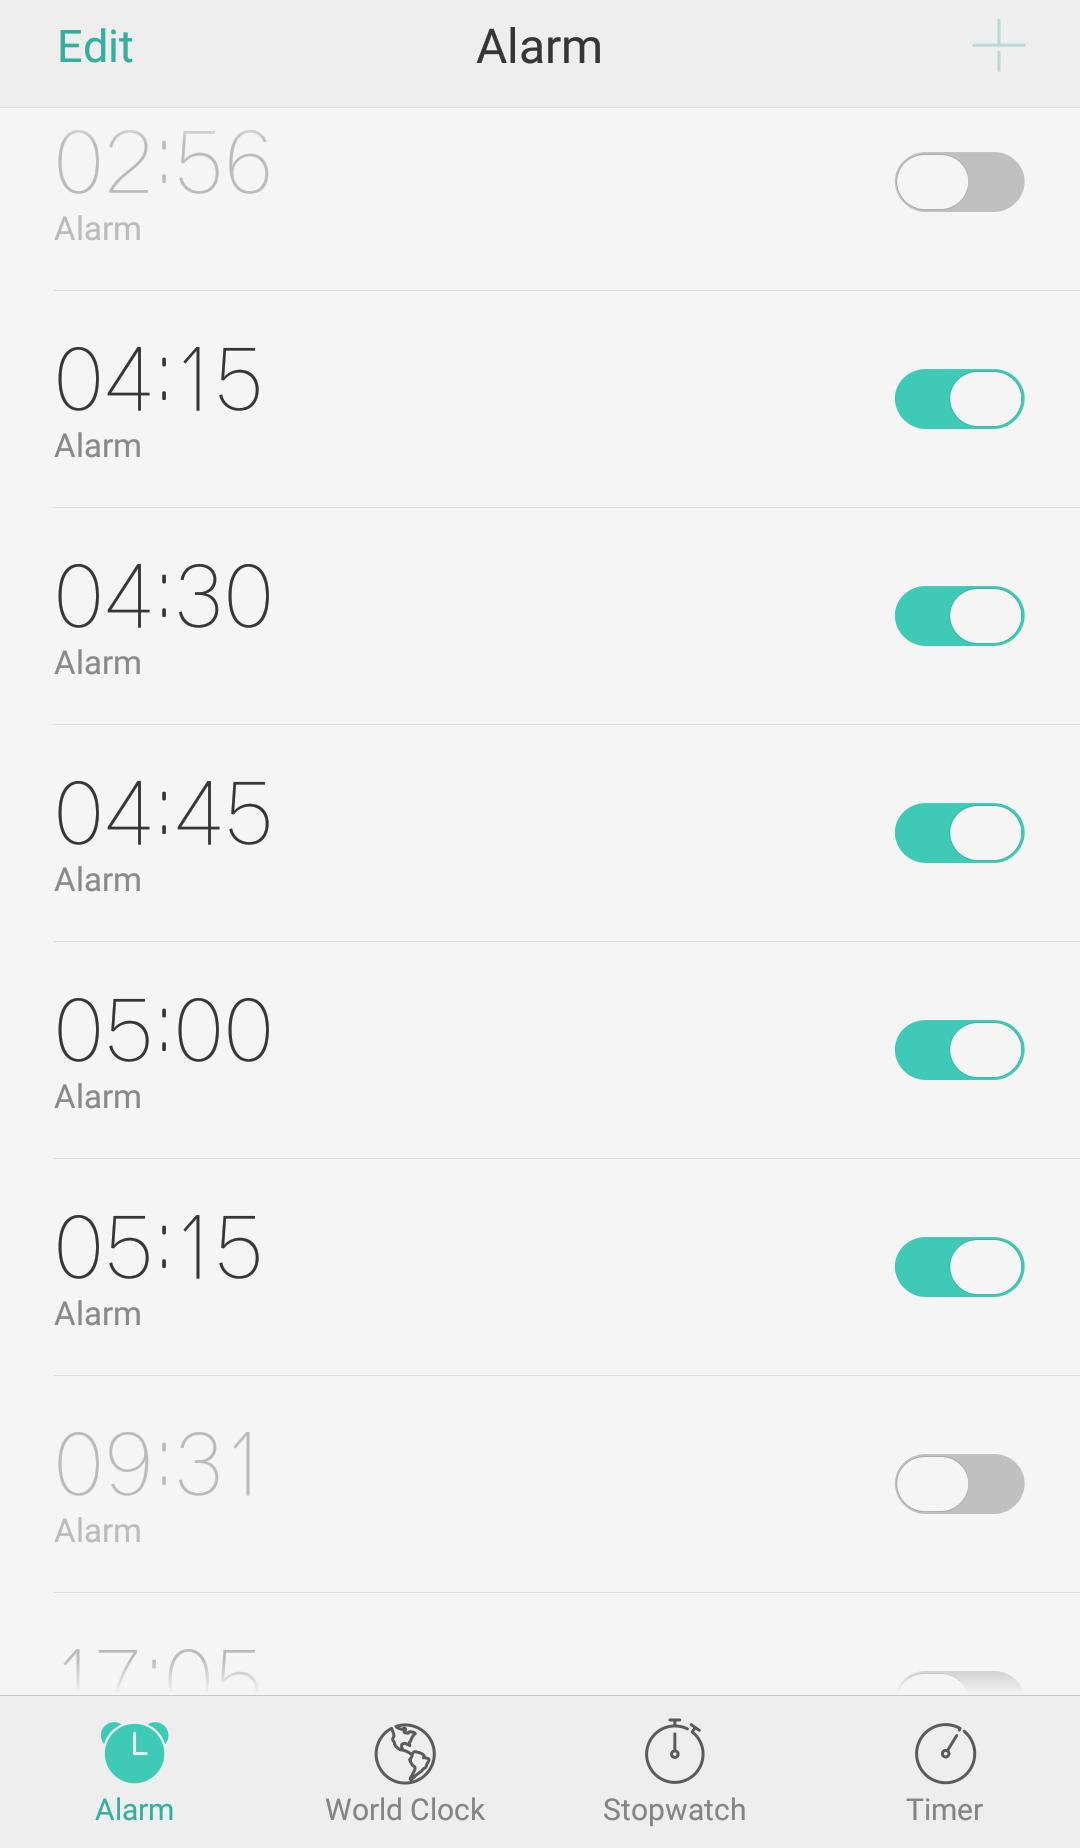 My Alarm Schedules